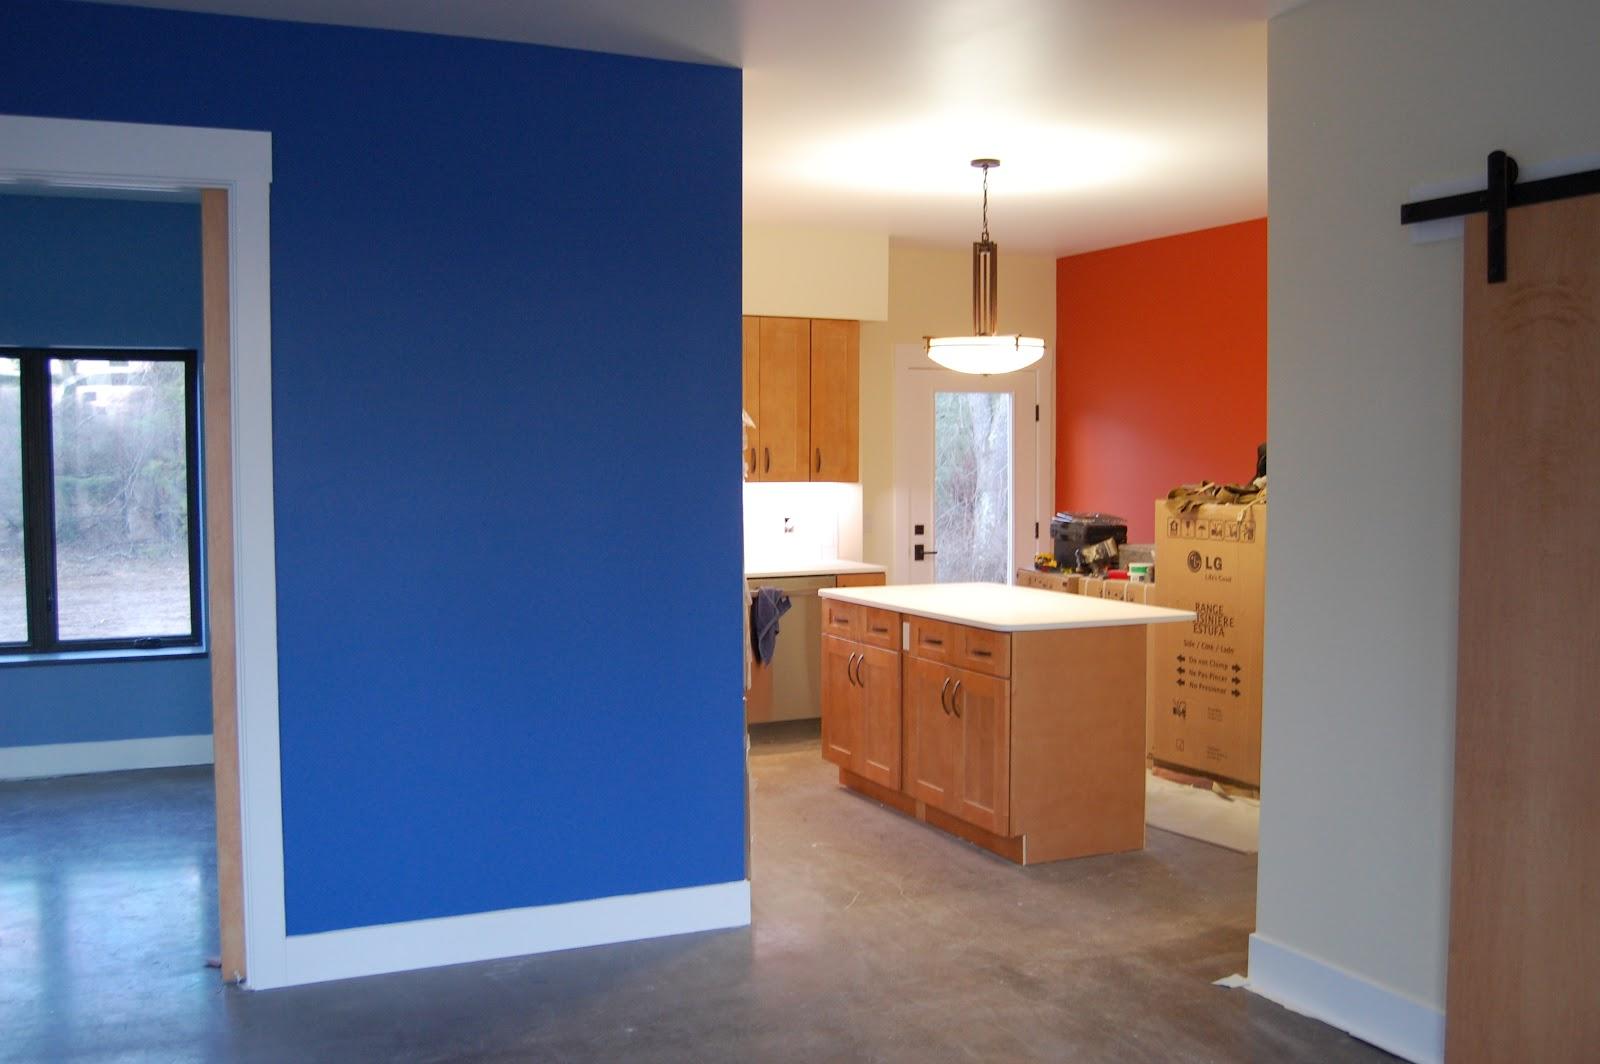 home depot paint brands home painting ideas. Black Bedroom Furniture Sets. Home Design Ideas